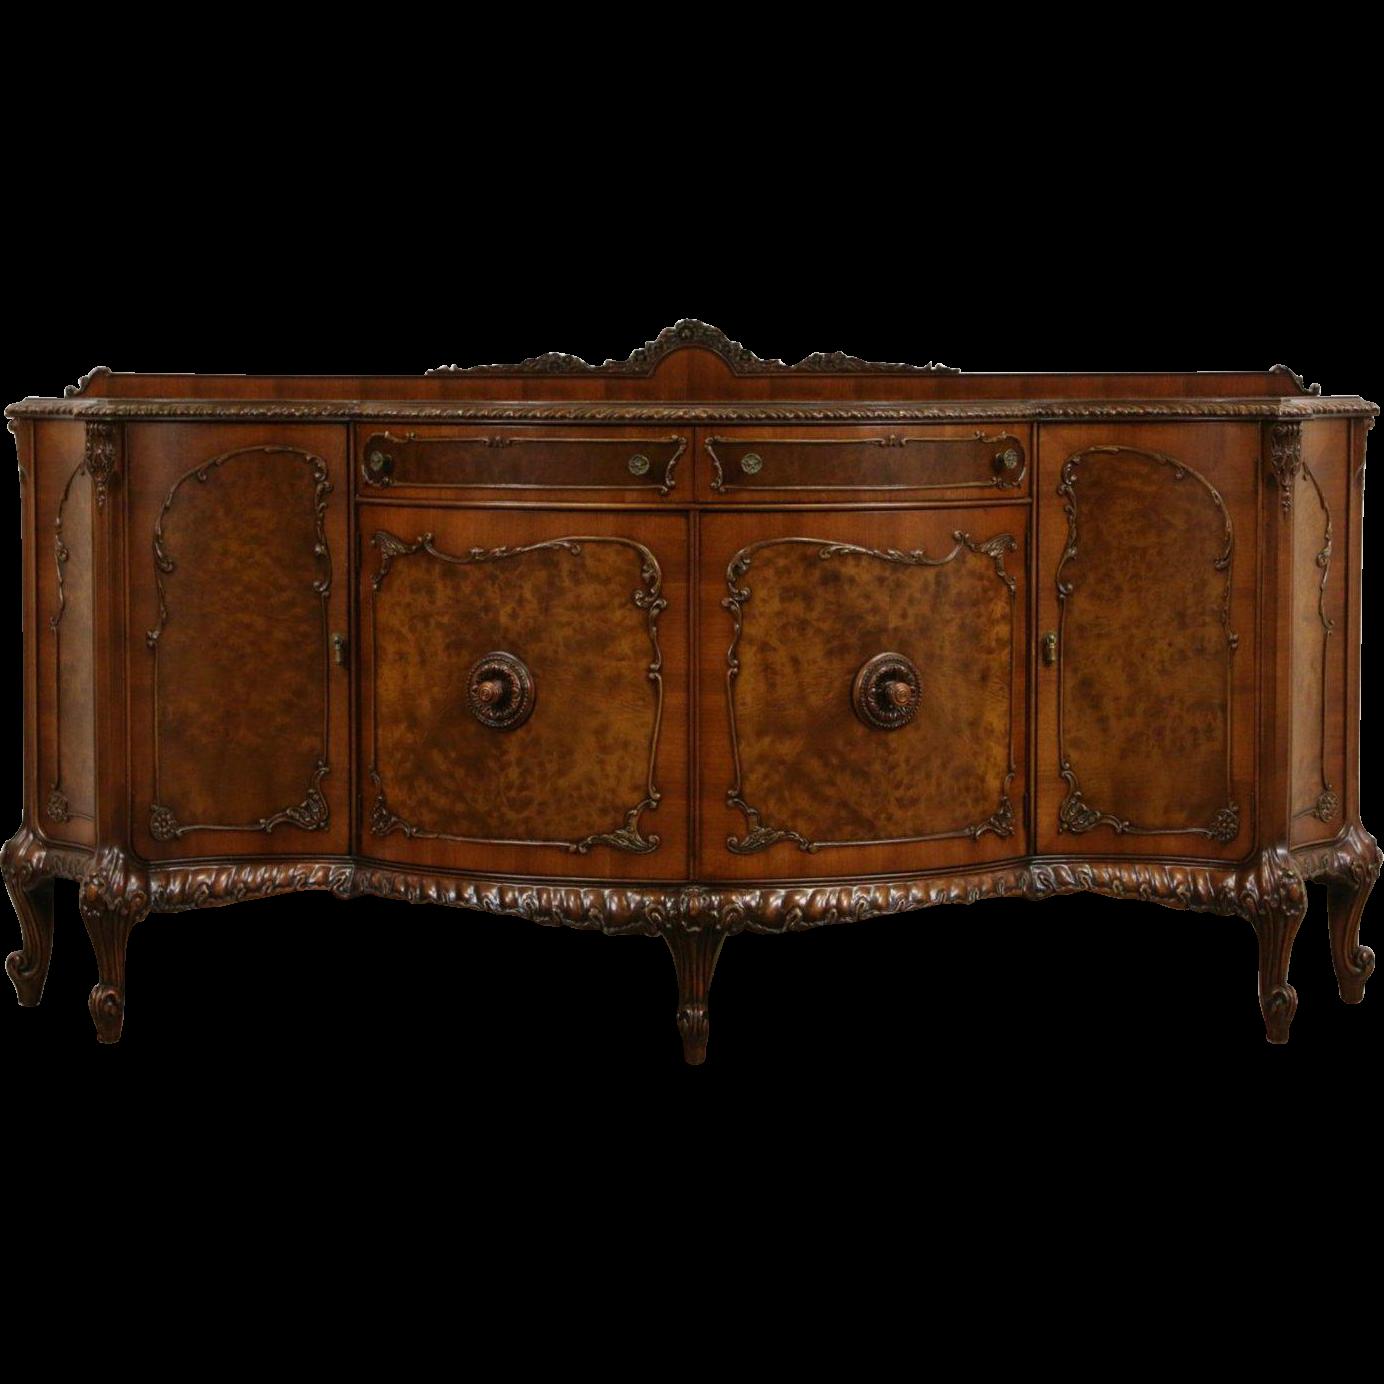 Romweber louis xv de gaulle carved sideboard server or buffet from